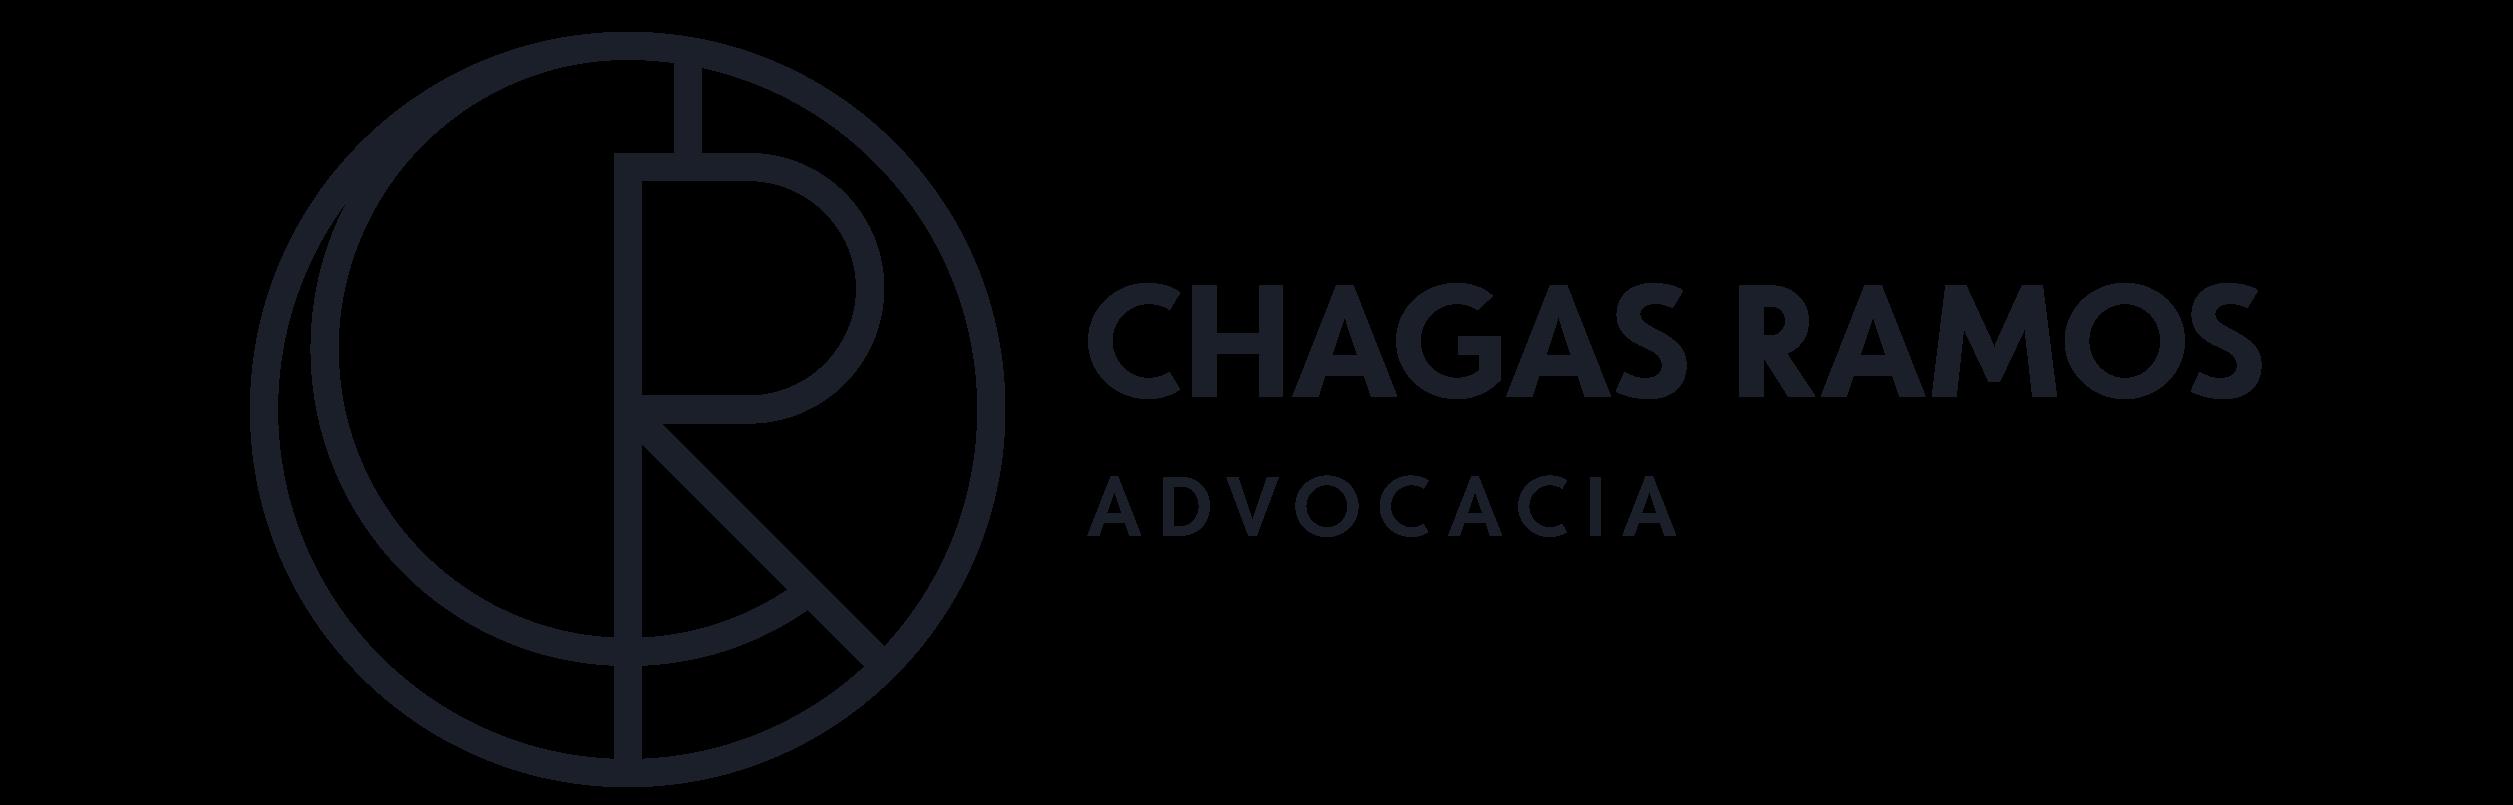 Chagas Ramos Advocacia